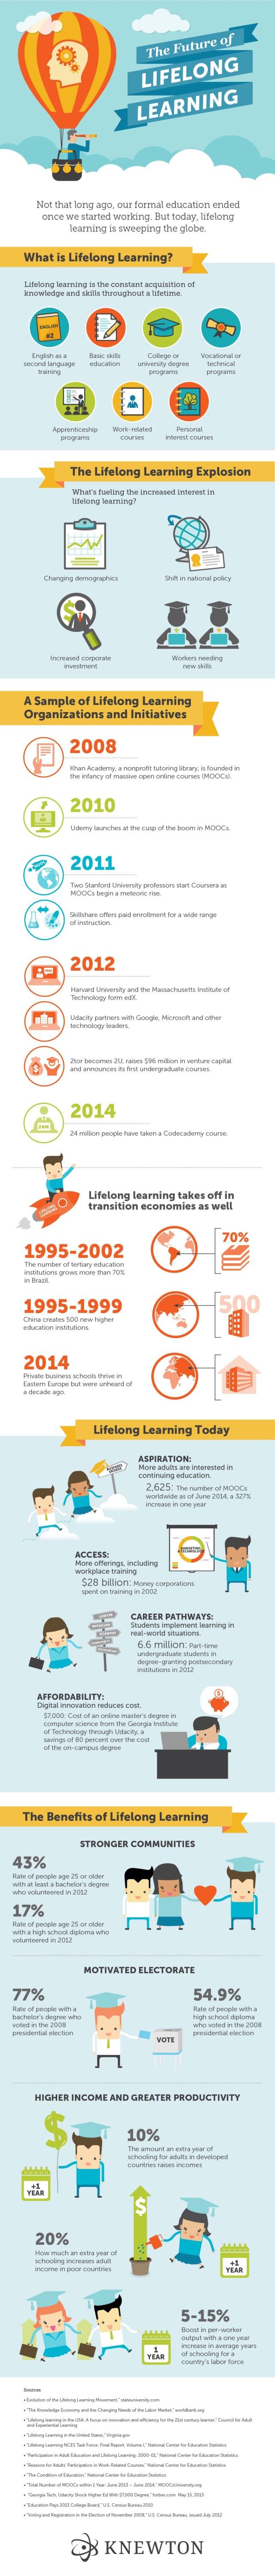 Knewton_Lifelong_Learning_Infographic-3